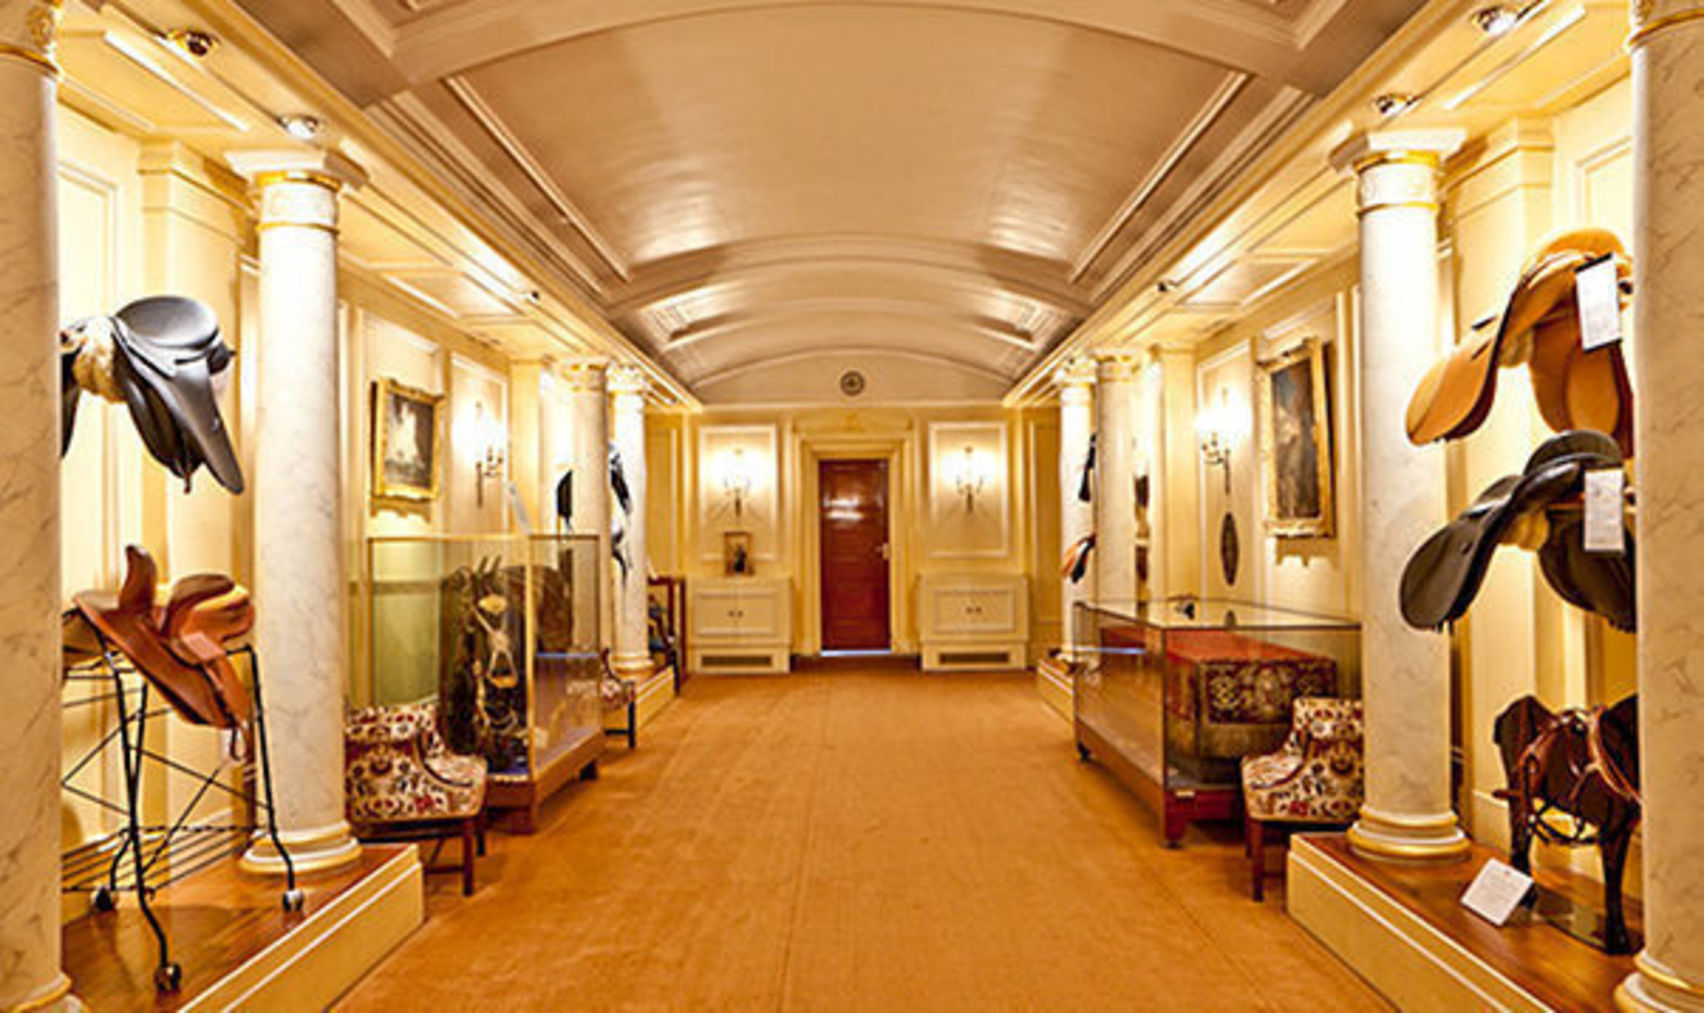 Tunnel Room, Saddler's Hall